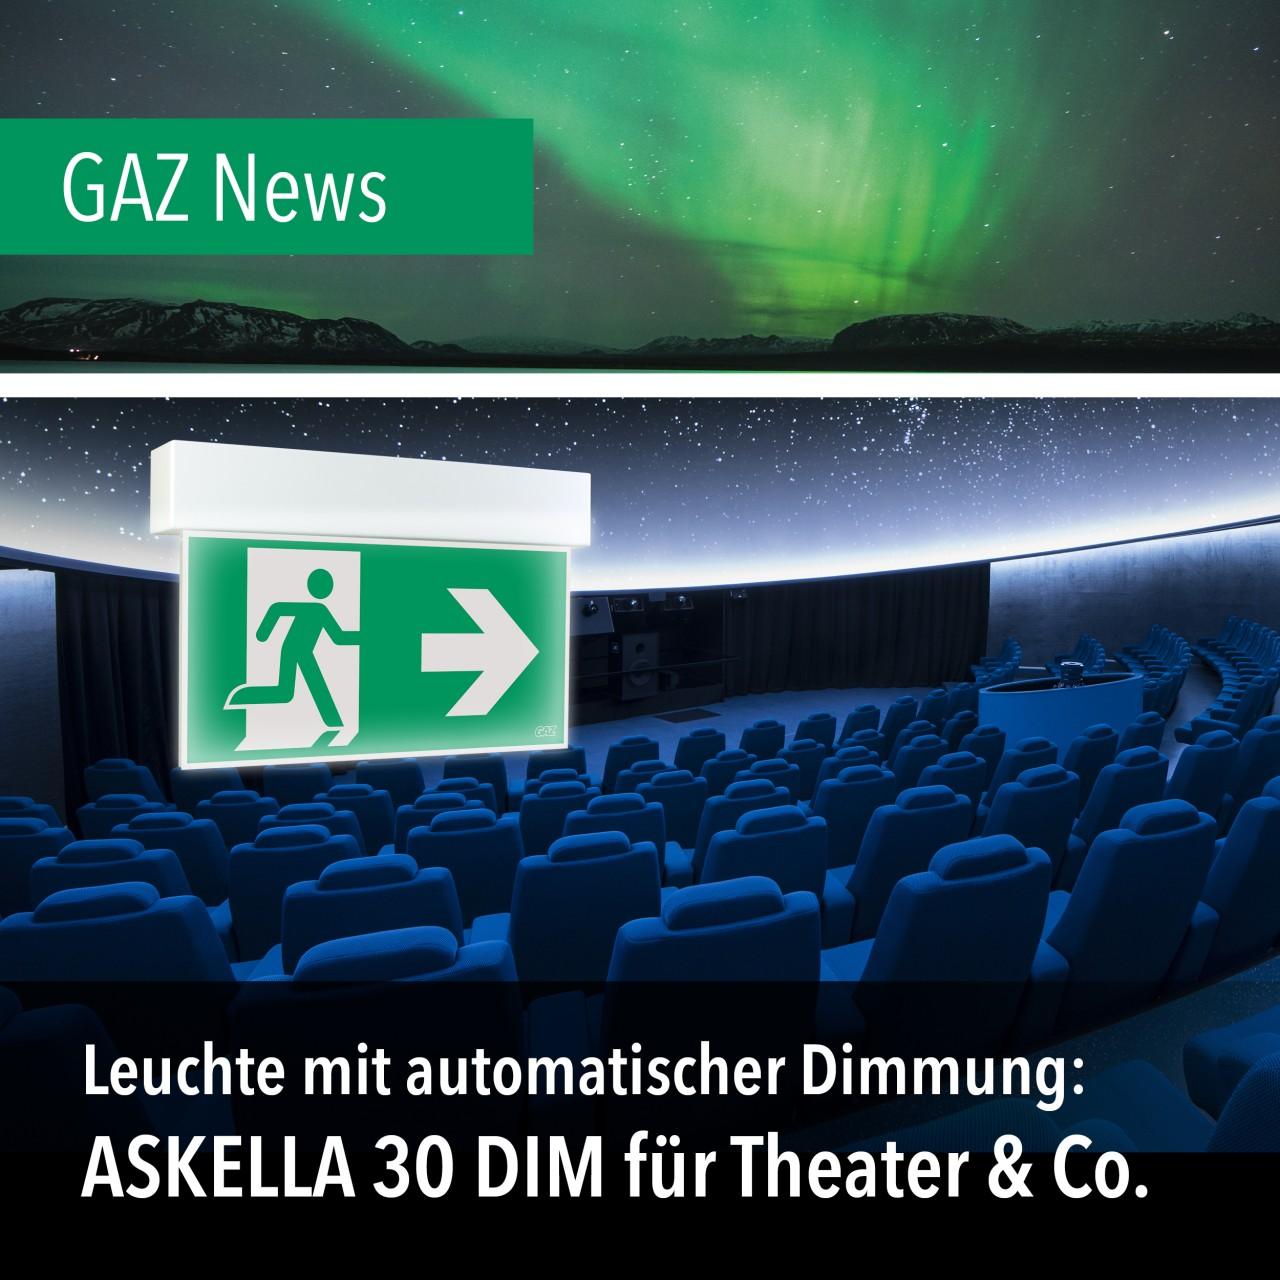 askella_30_dimmbar_GAZ_600x600px